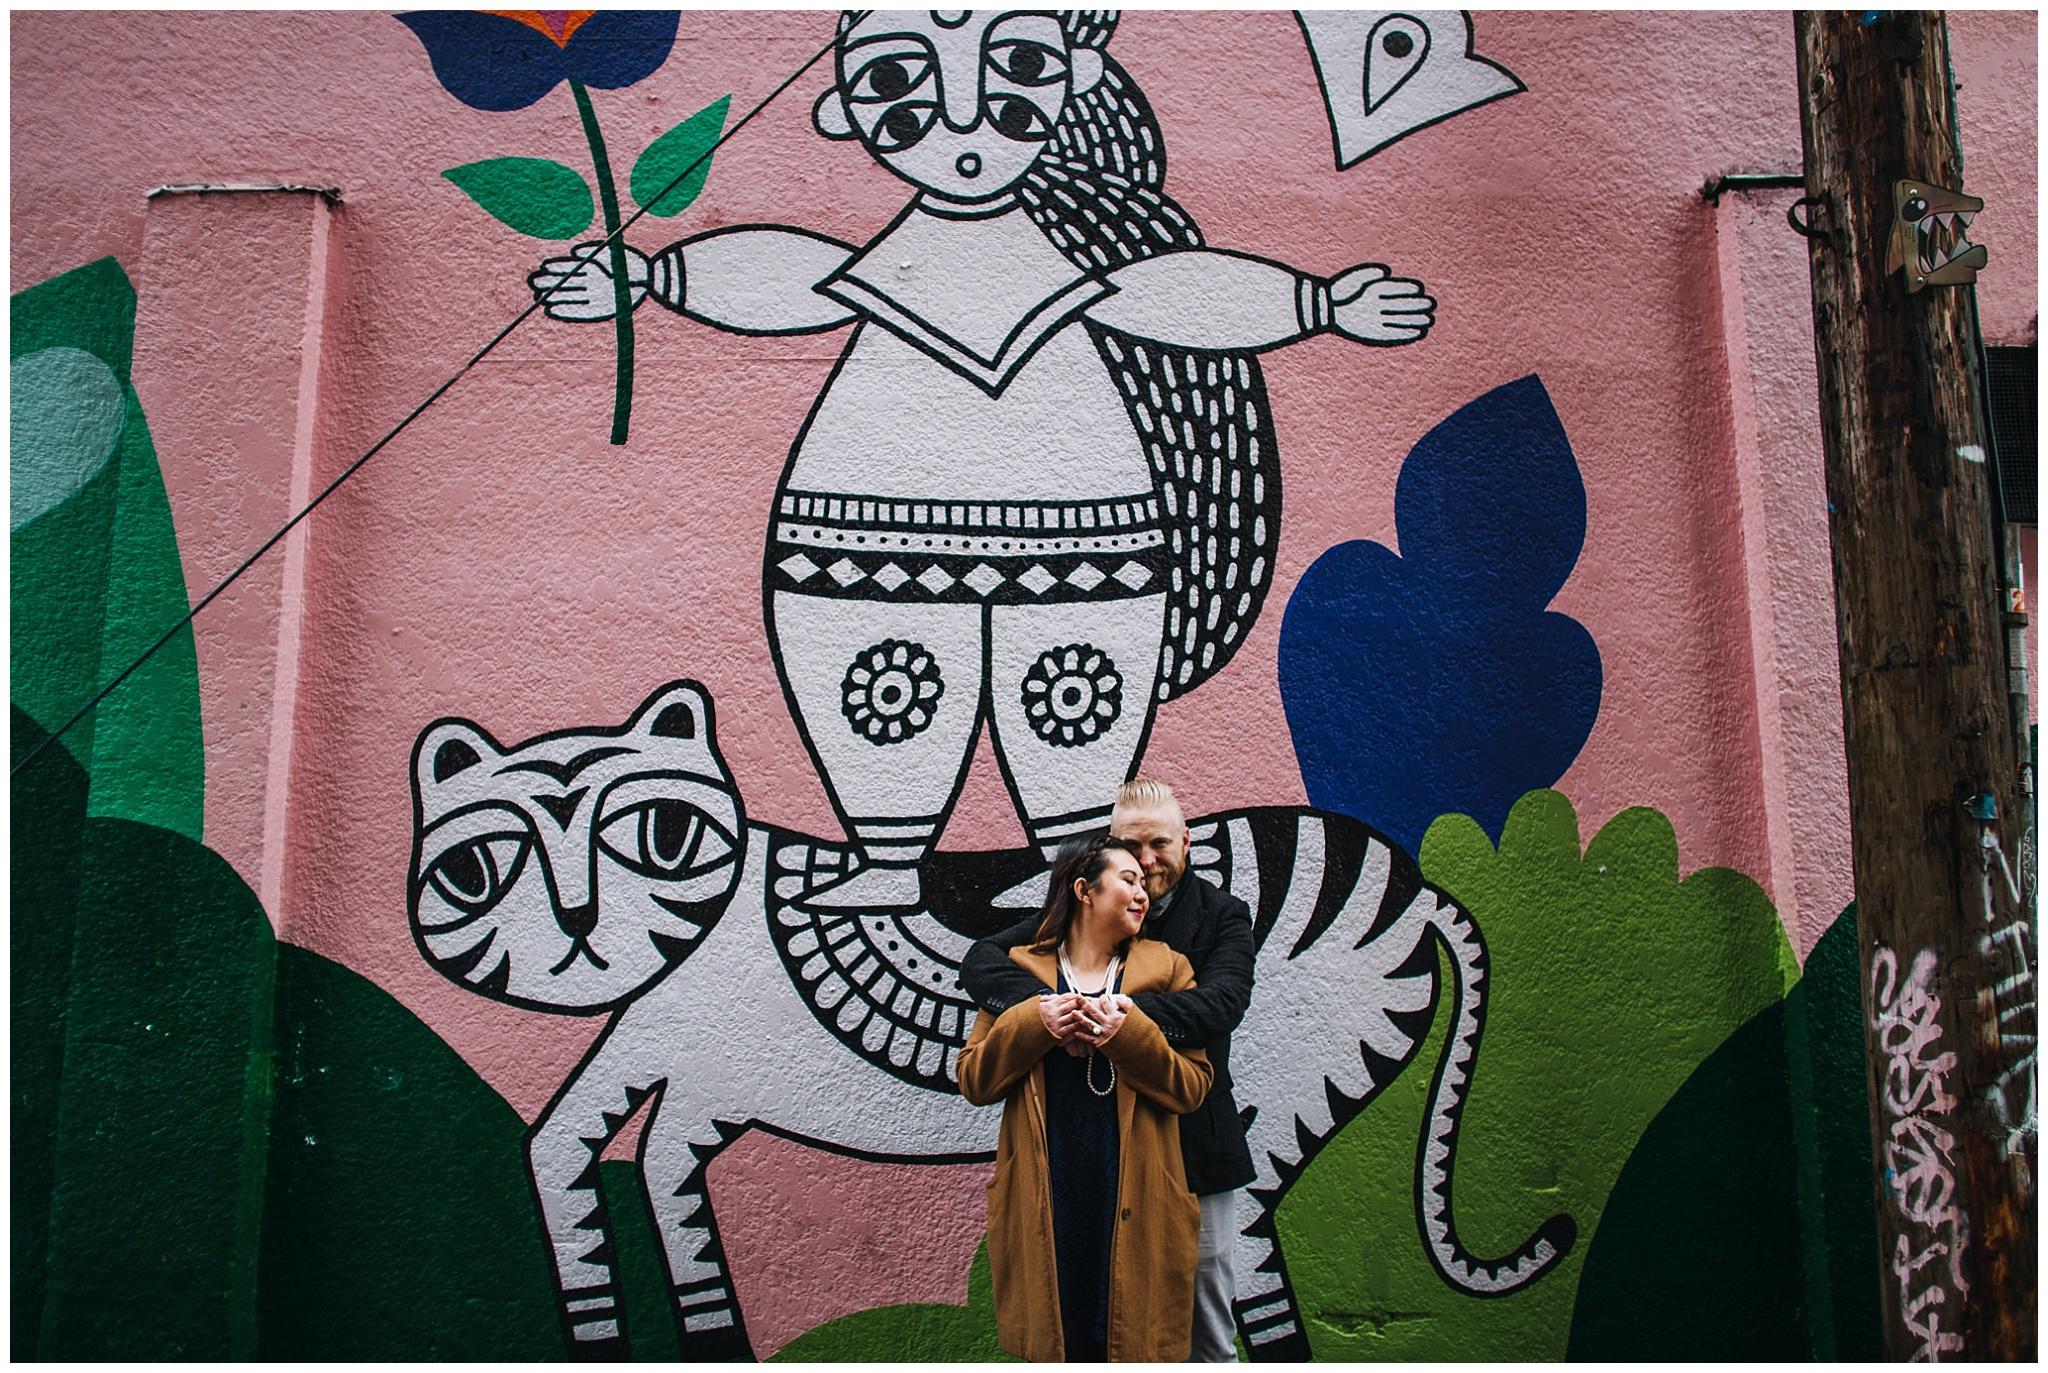 vancouver mural festival 2017 engagement photos sandeep johal art